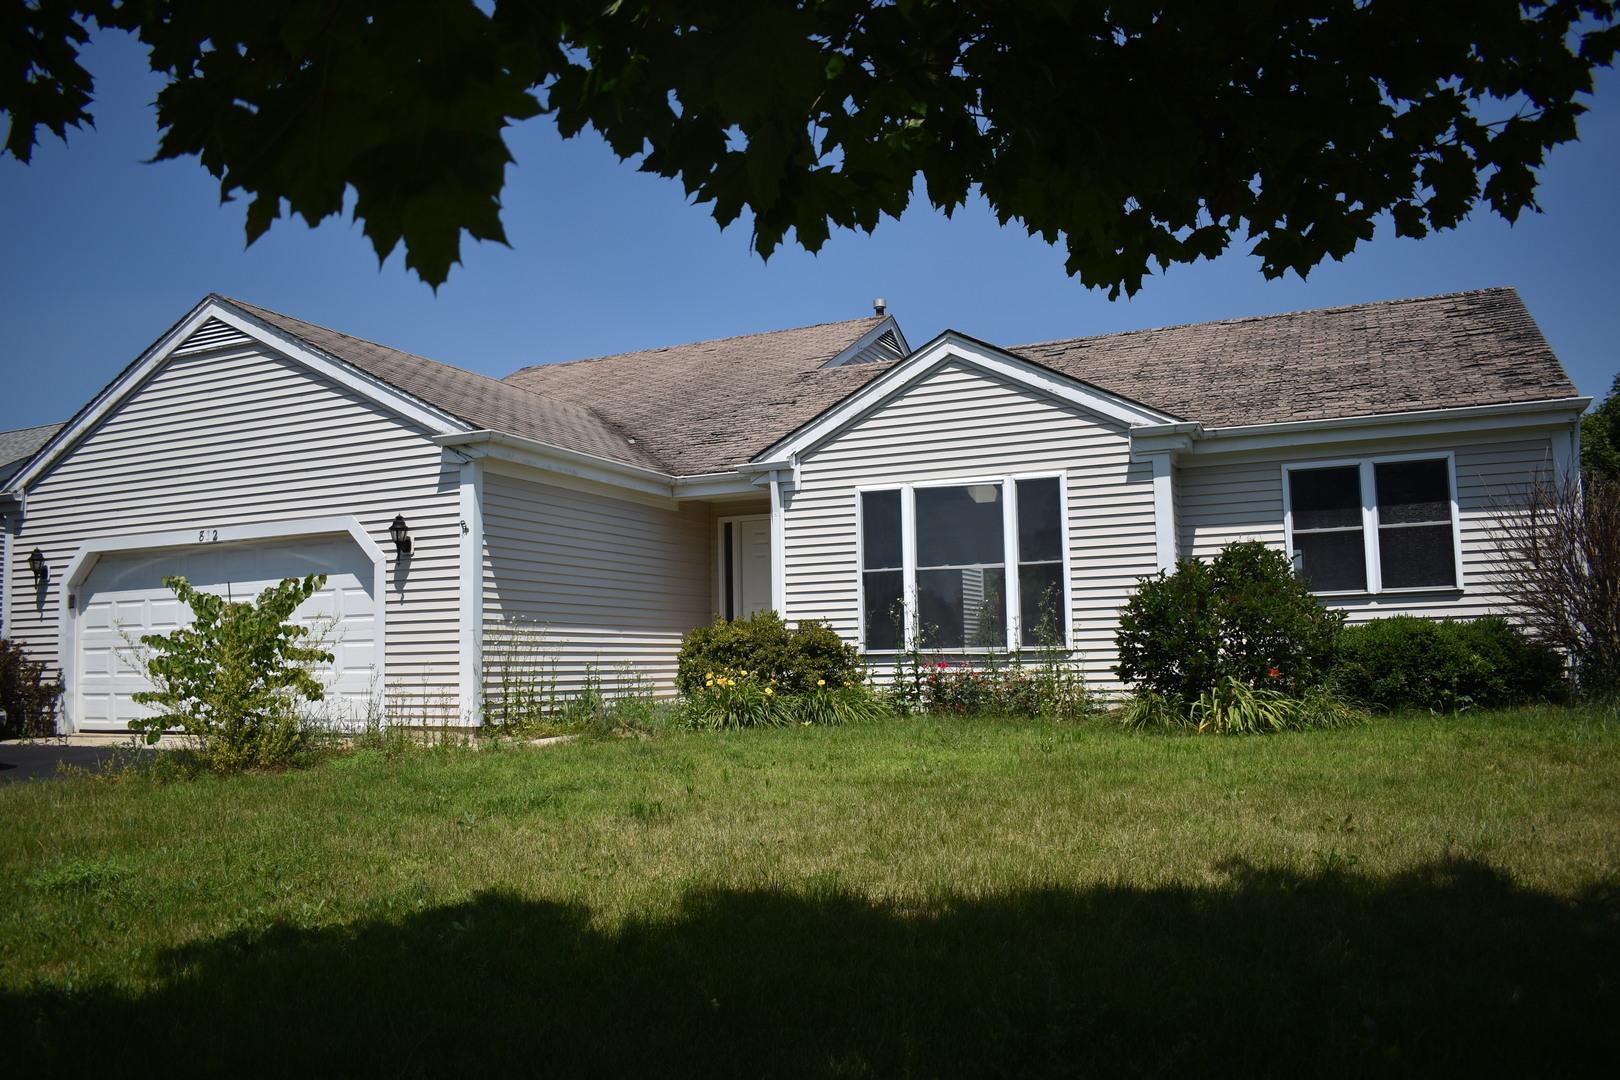 832 Buttonwood Court, Marengo, IL 60152